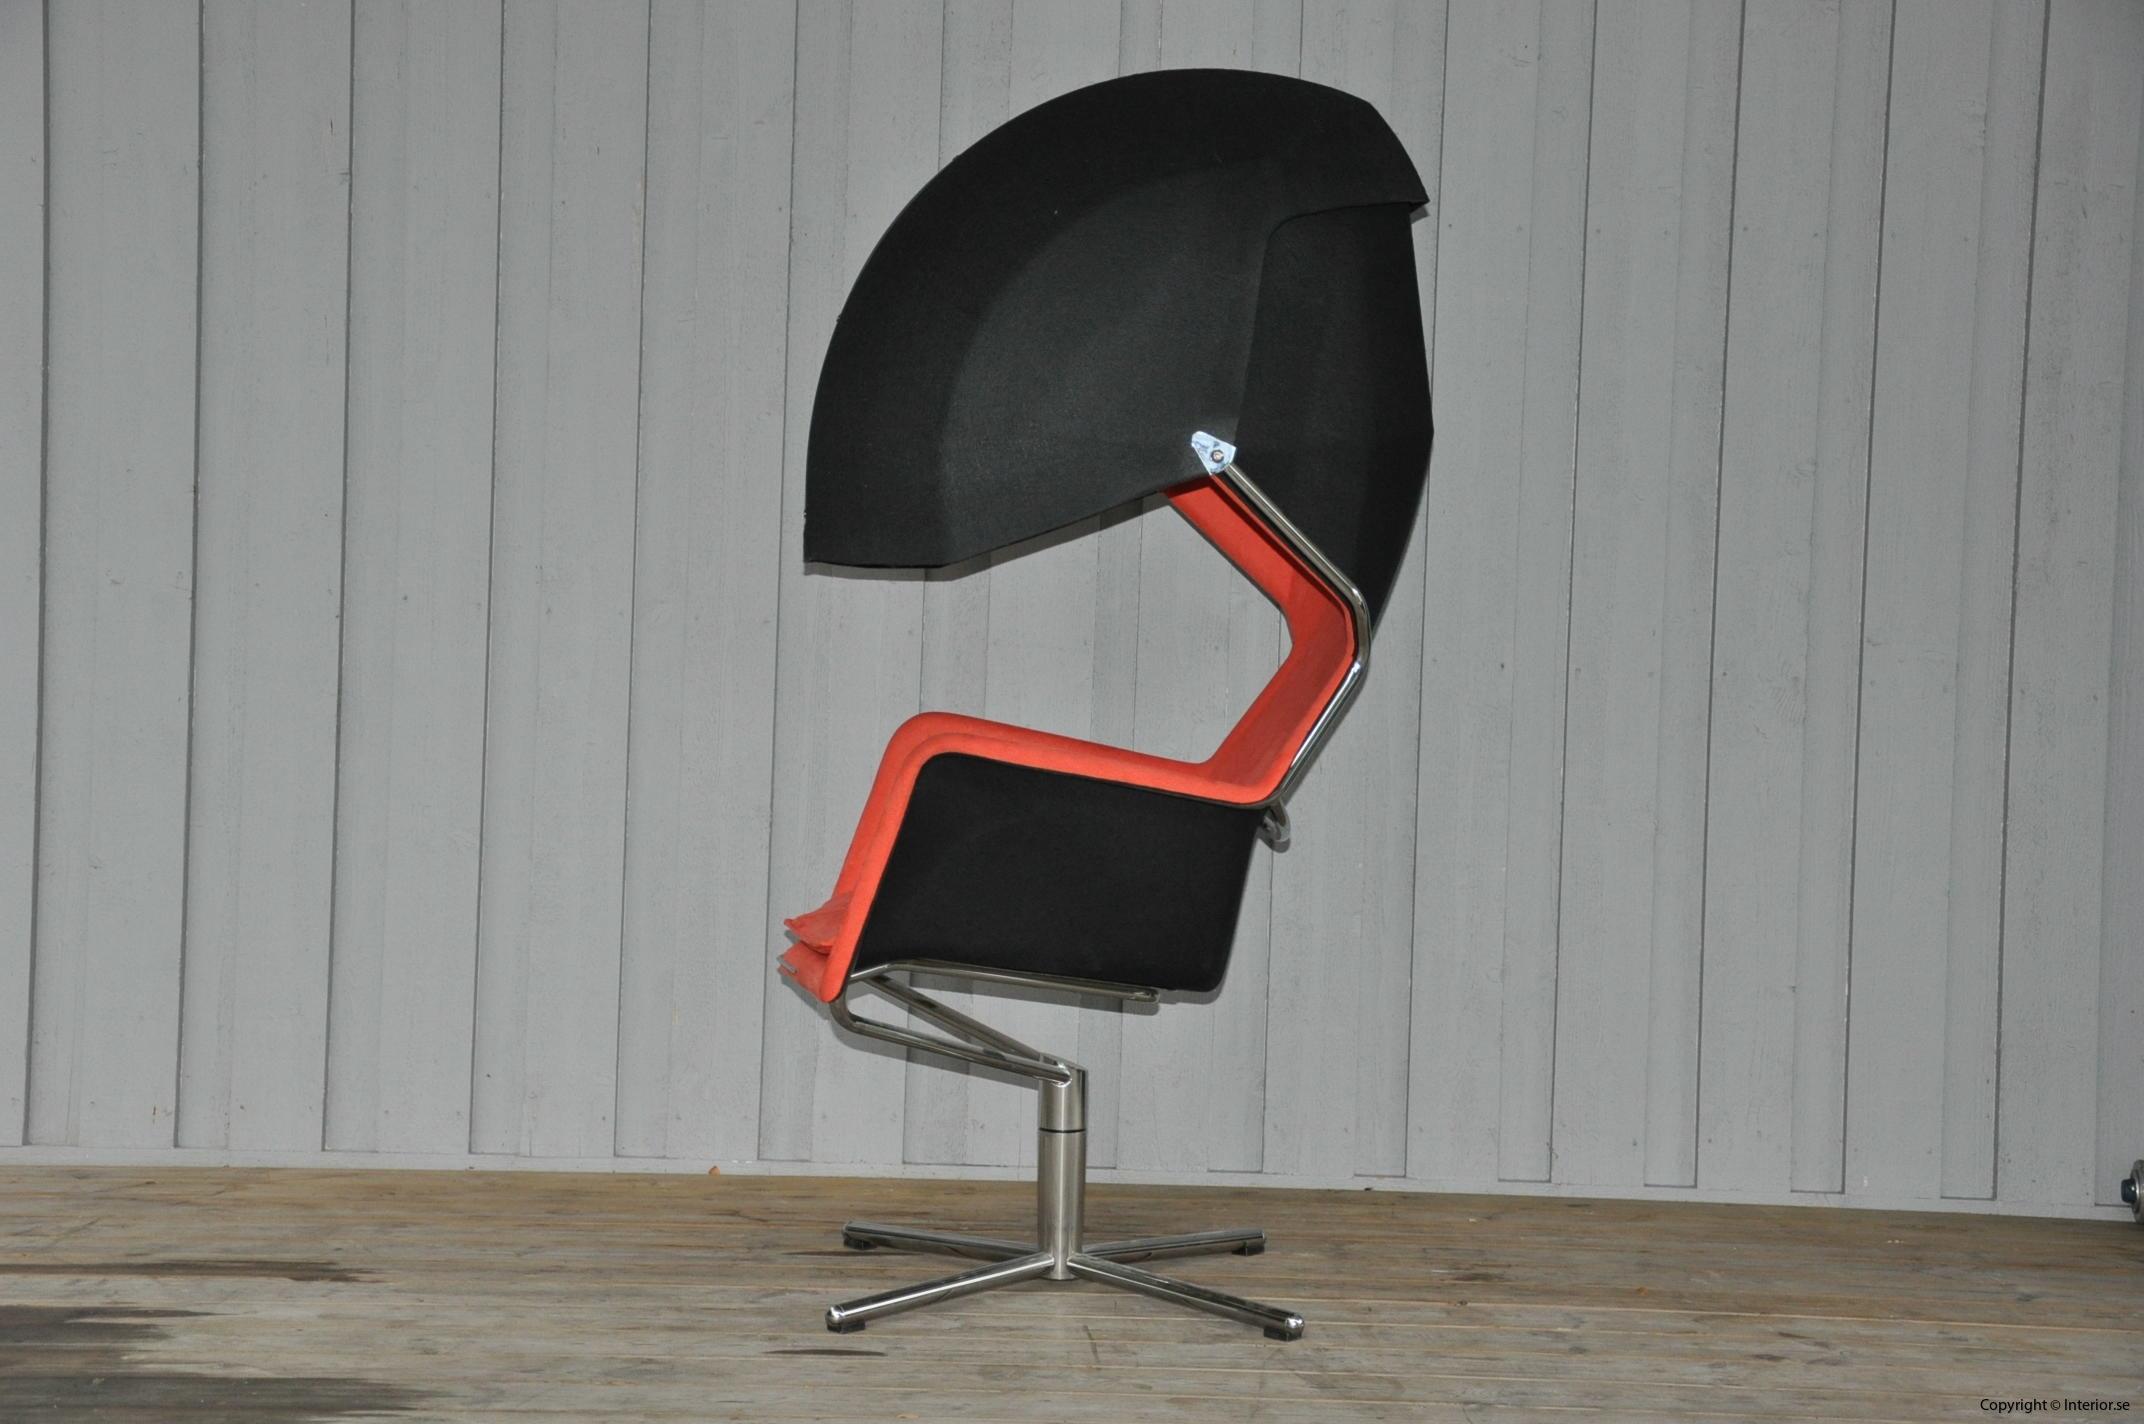 Fåtöljer sessel armchair Blå Station Peekaboo - Flera Färger - Stefan Borselius (3)